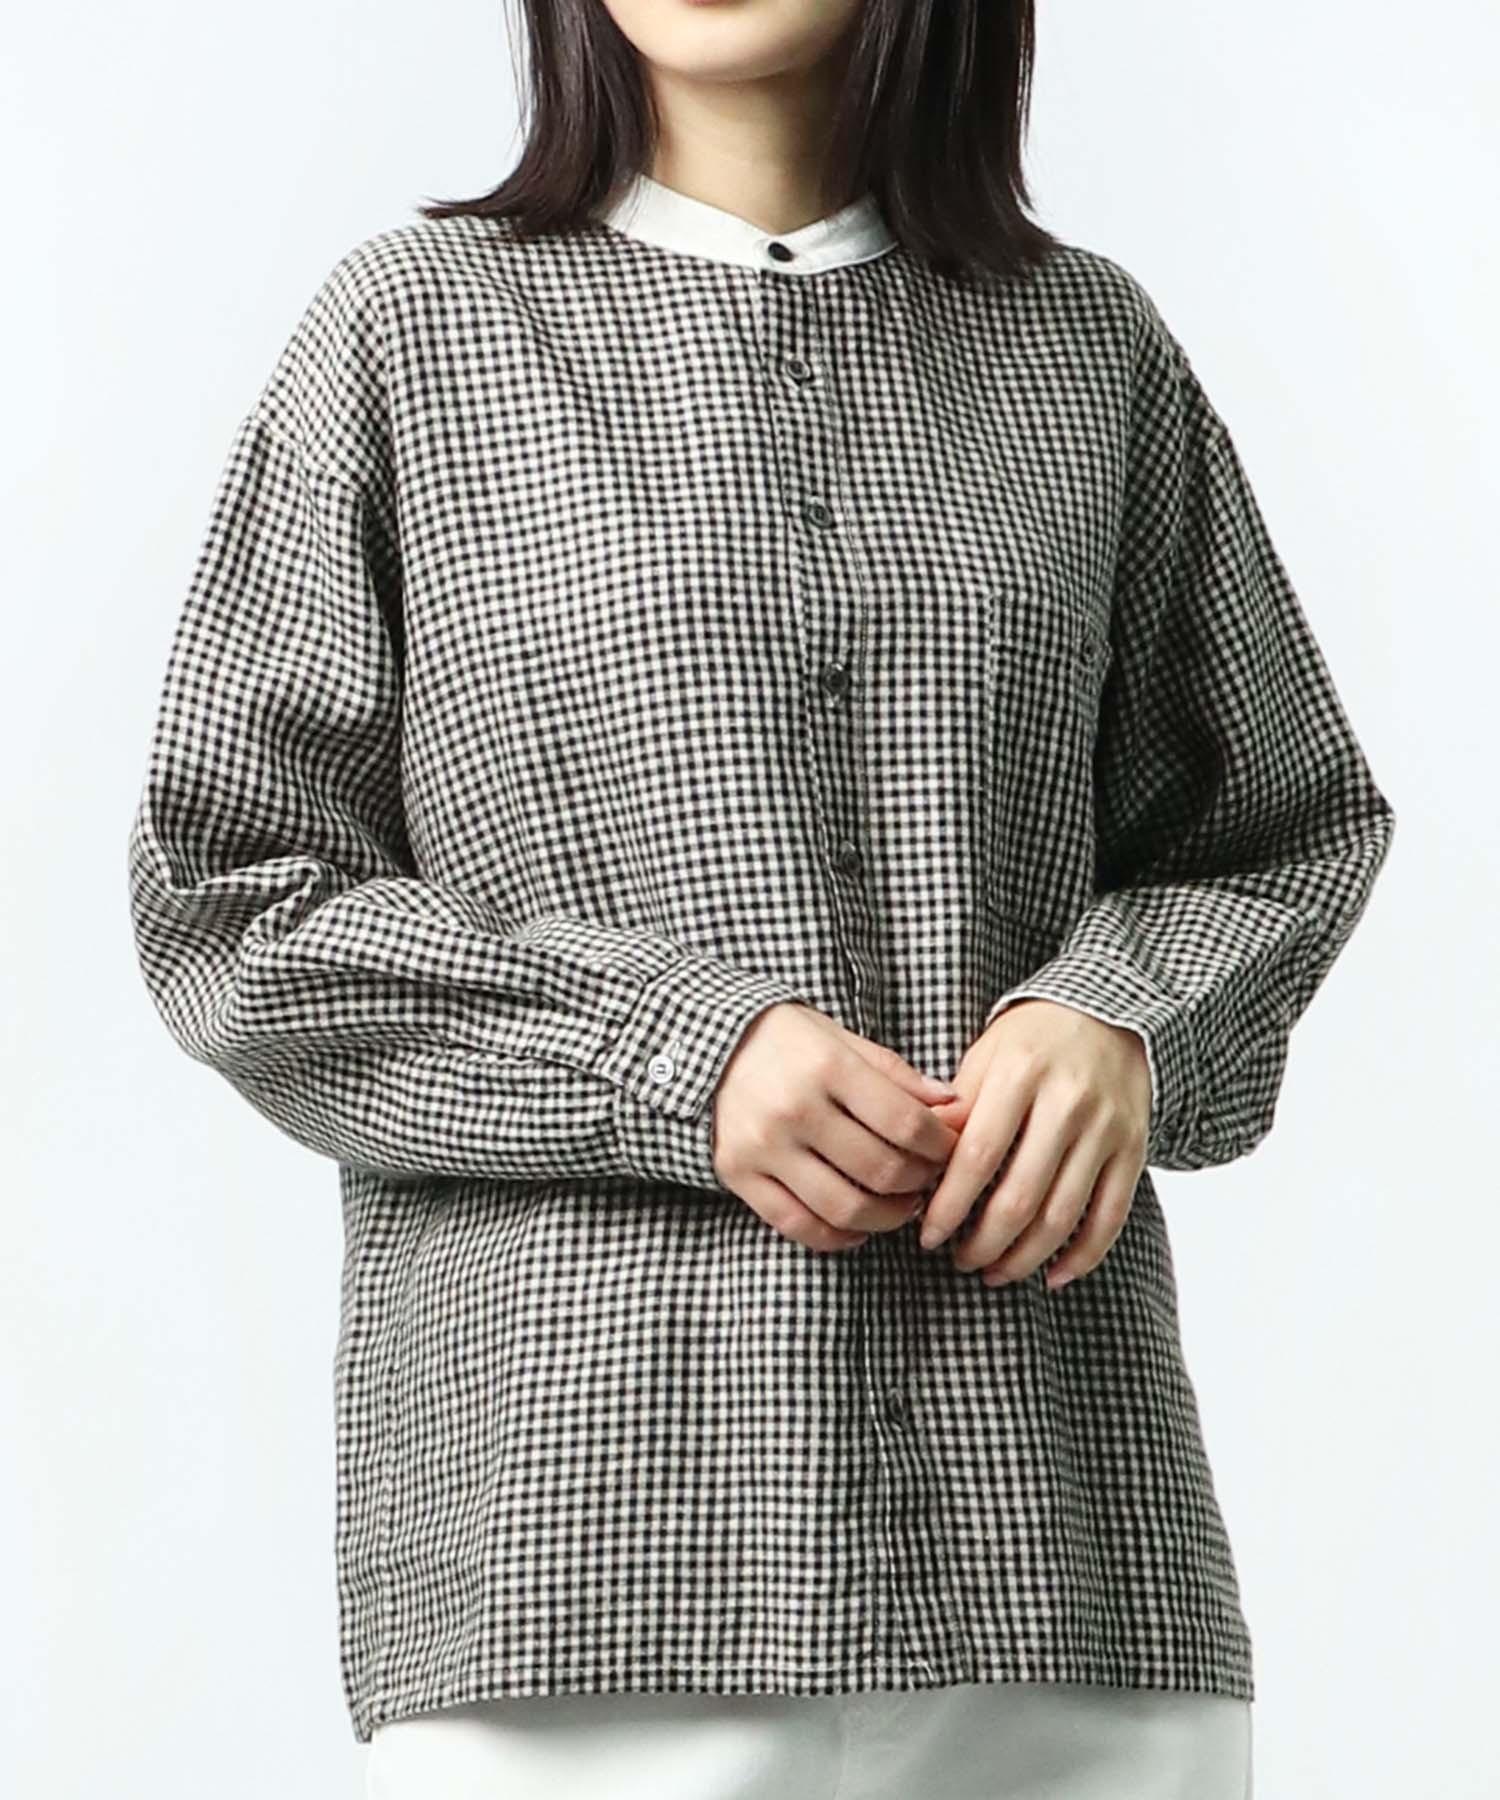 【 HEAVENLY / ヘヴンリー 】Linen Cleric BandCollar Shirt 2147082